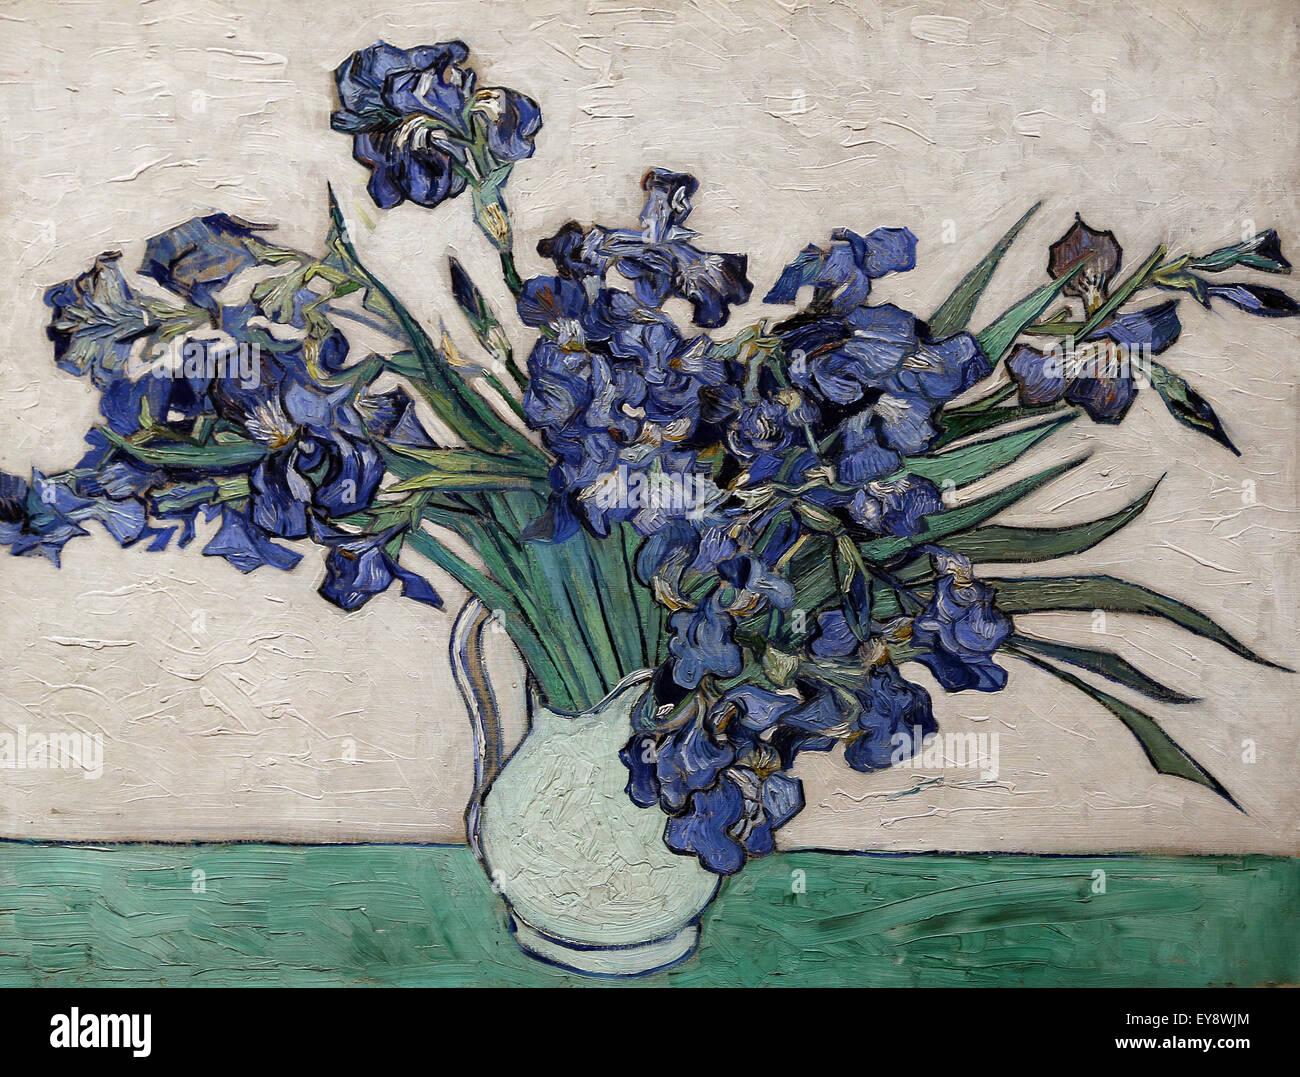 Vincent van Gogh (1853-1890).  Dutch painter. Irise, 1890. Oil on canvas. Metropolitan Museum of Art. NY. USA. - Stock Image